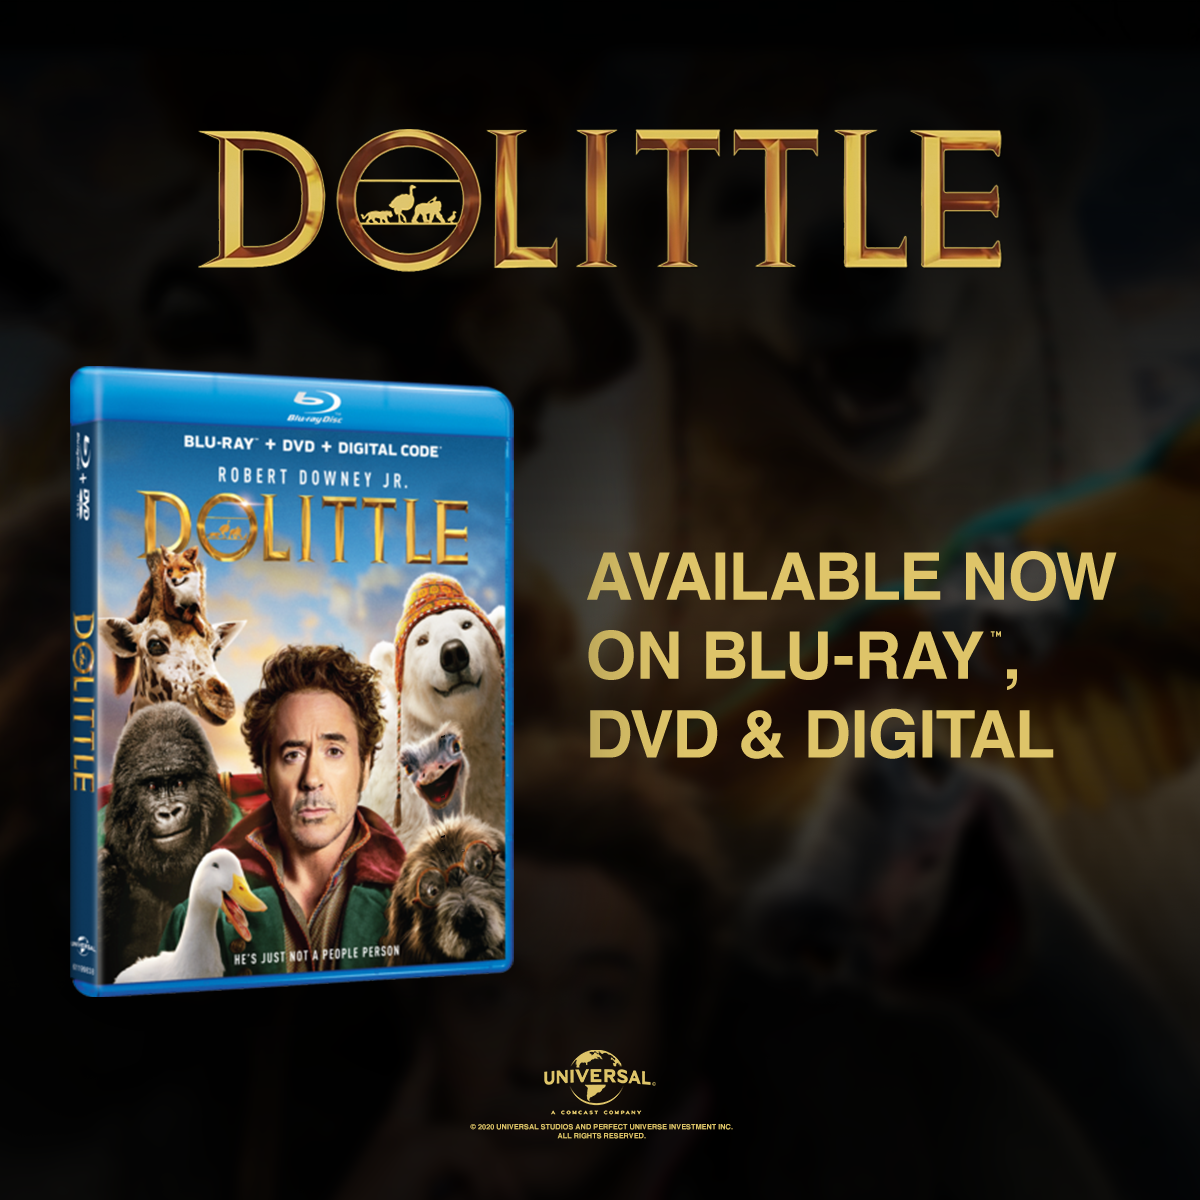 Win a Digital Download of Dolittle!